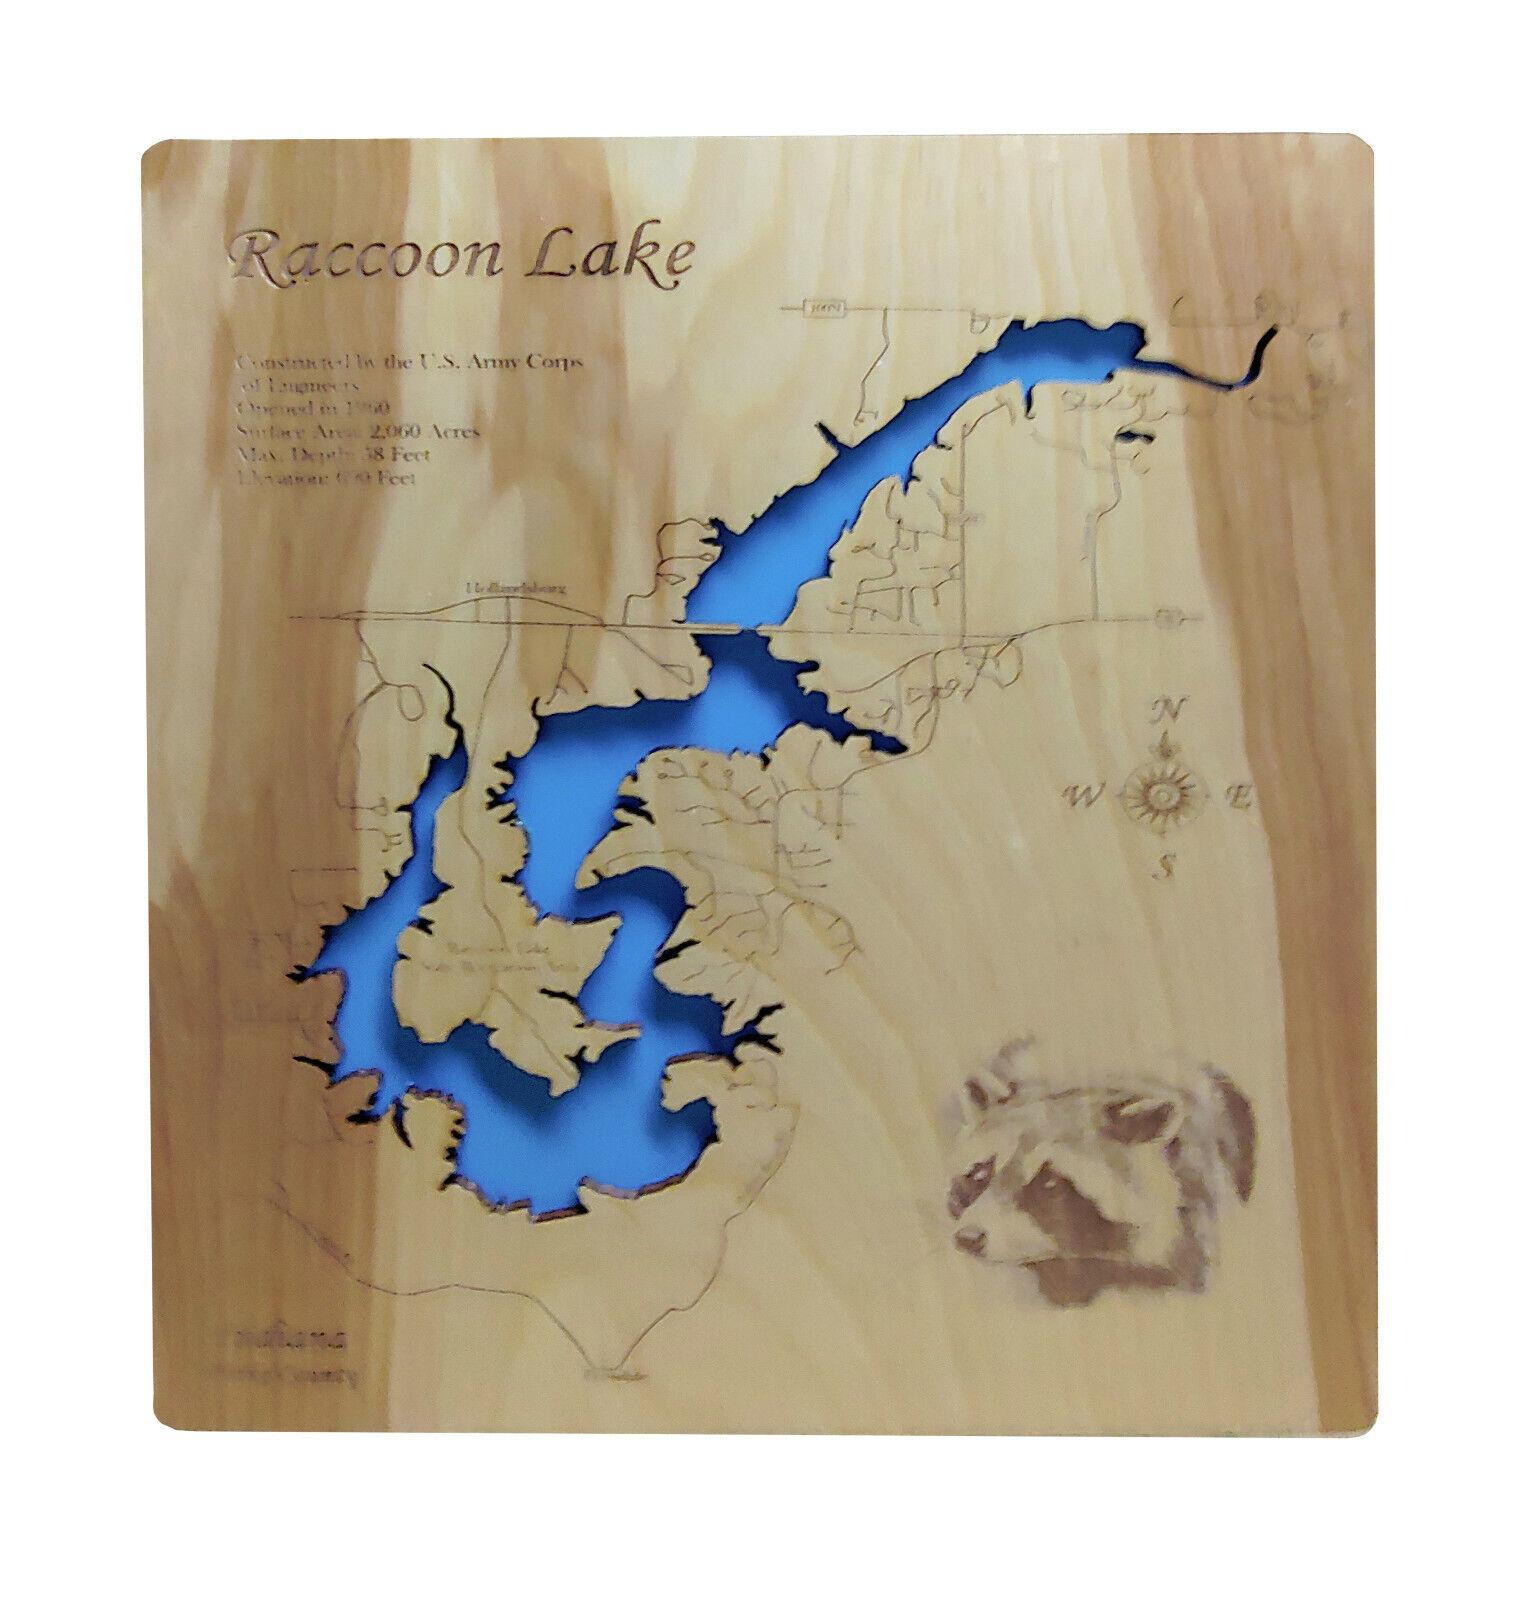 Wood Laser Cut Map of Raccoon Lake, Indiana